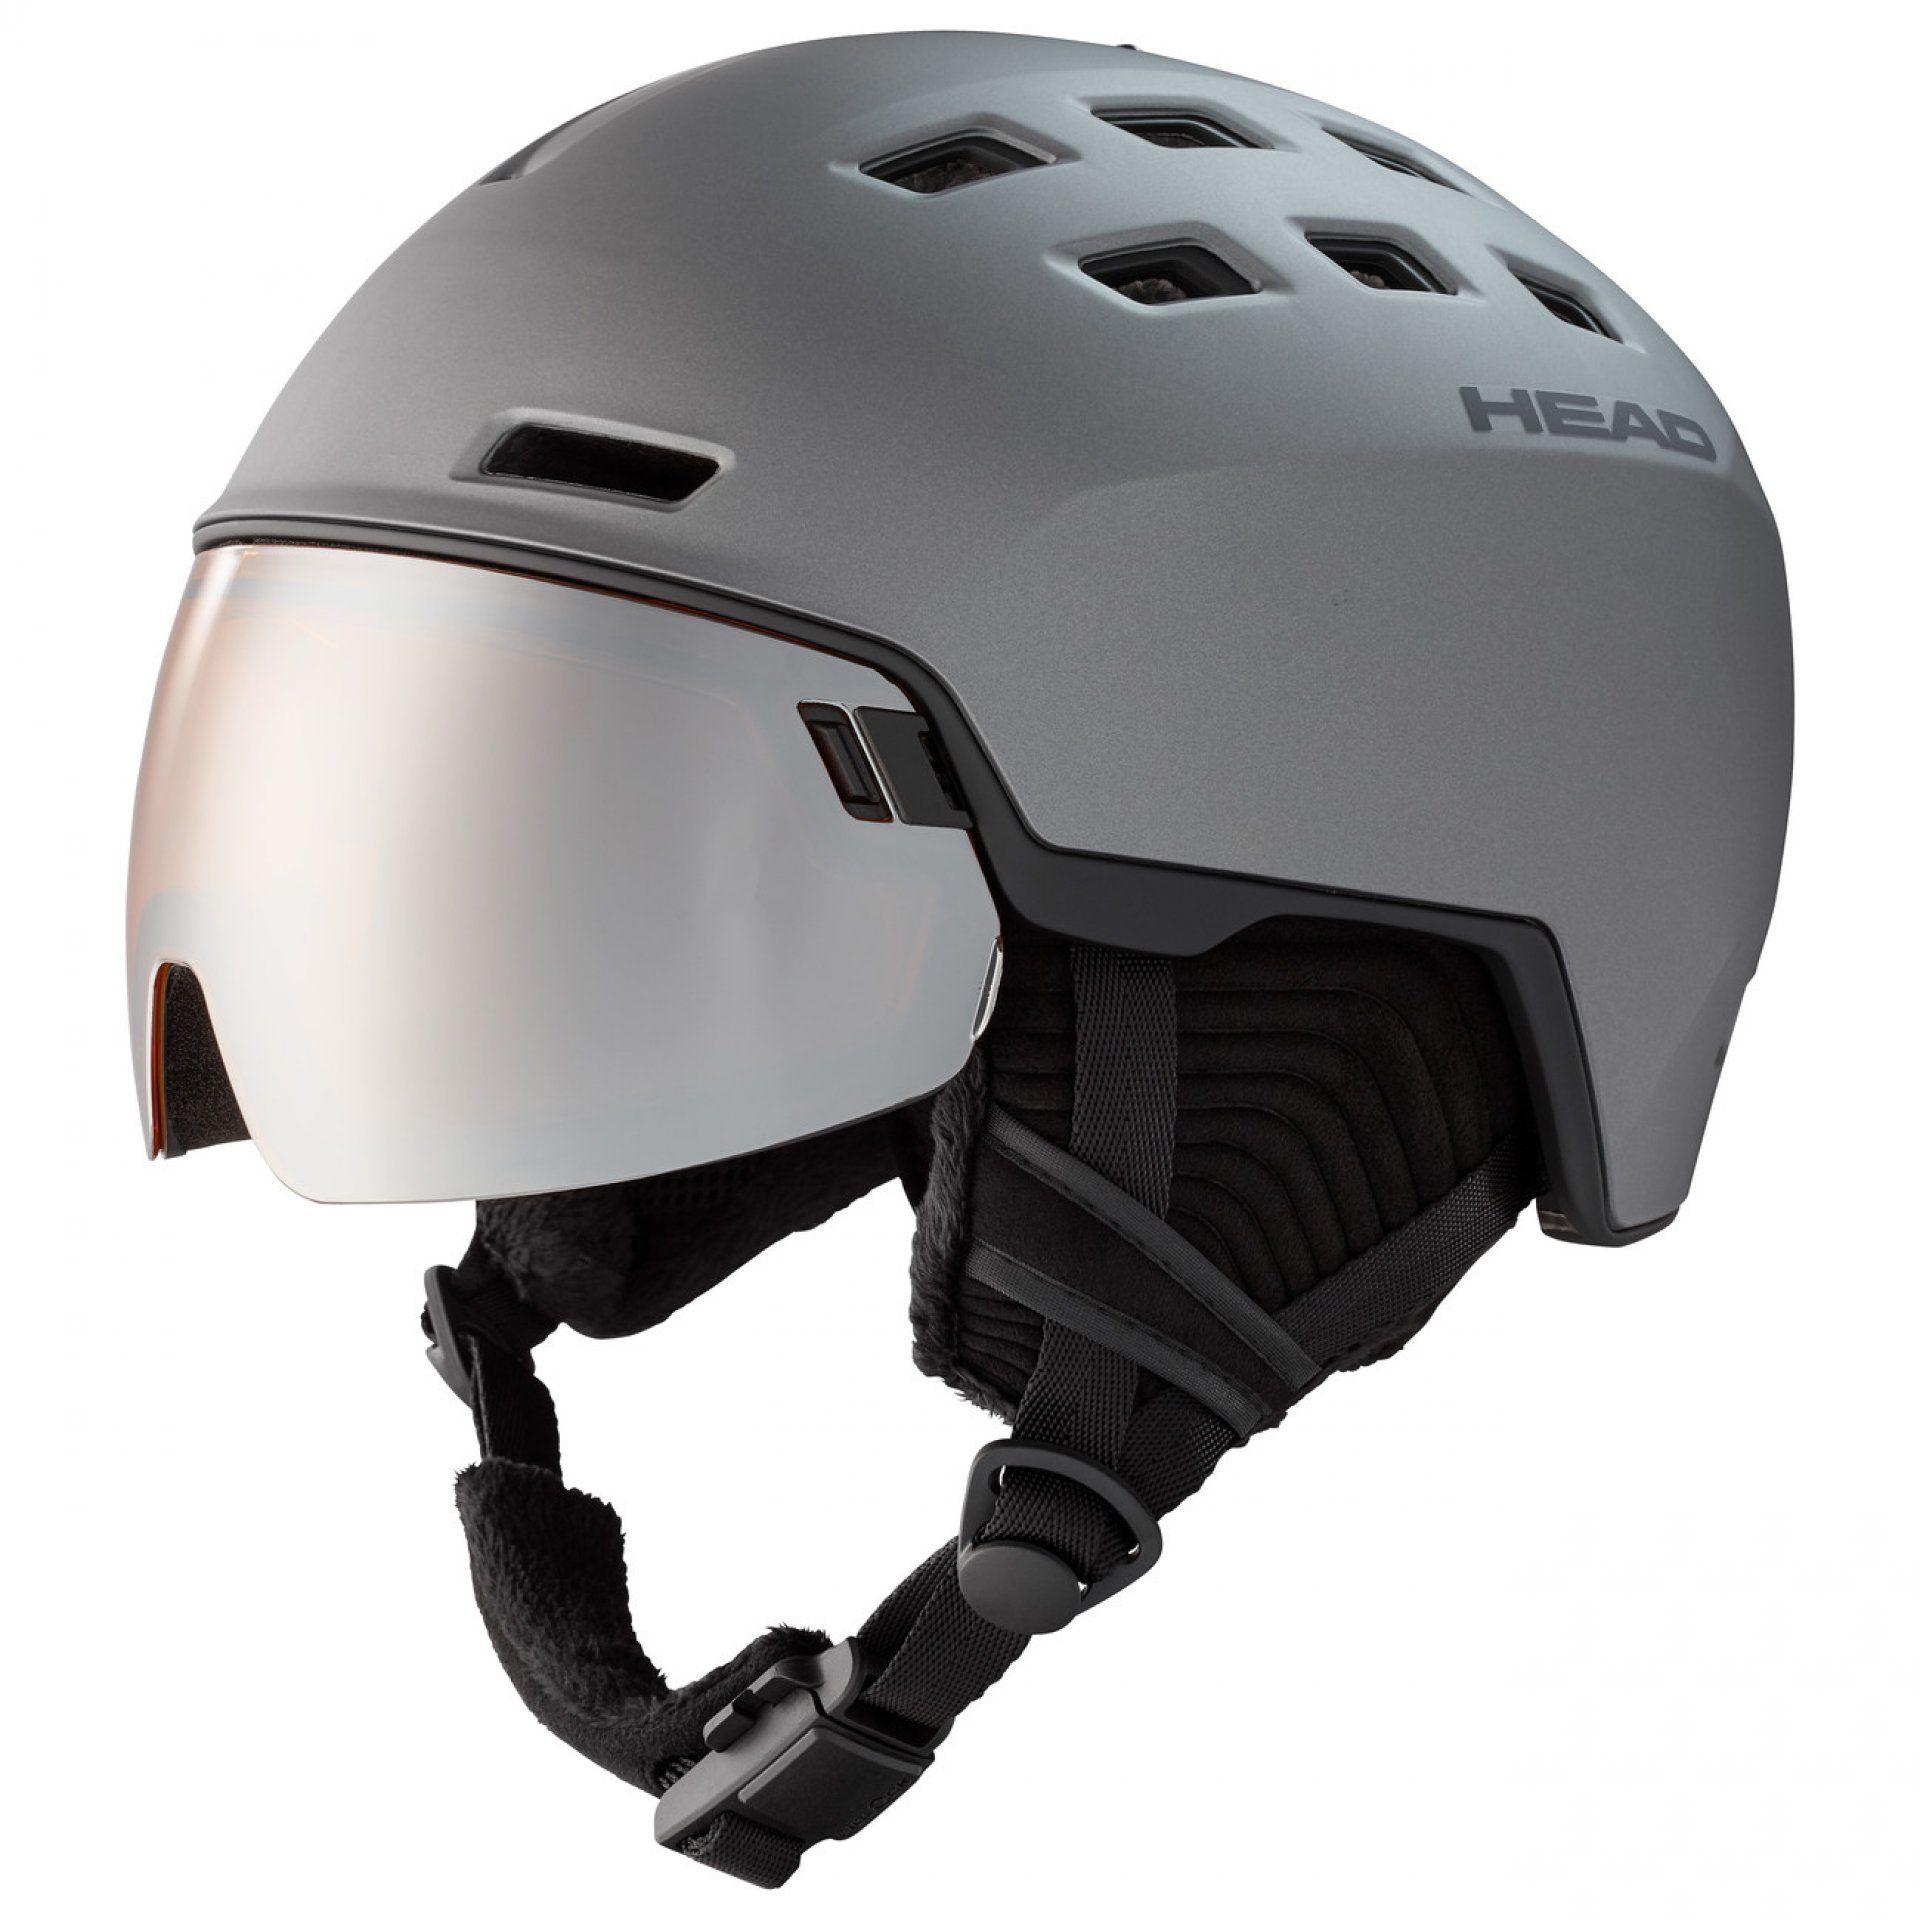 KASK HEAD RADAR 323430 GRAPHITE|BLACK